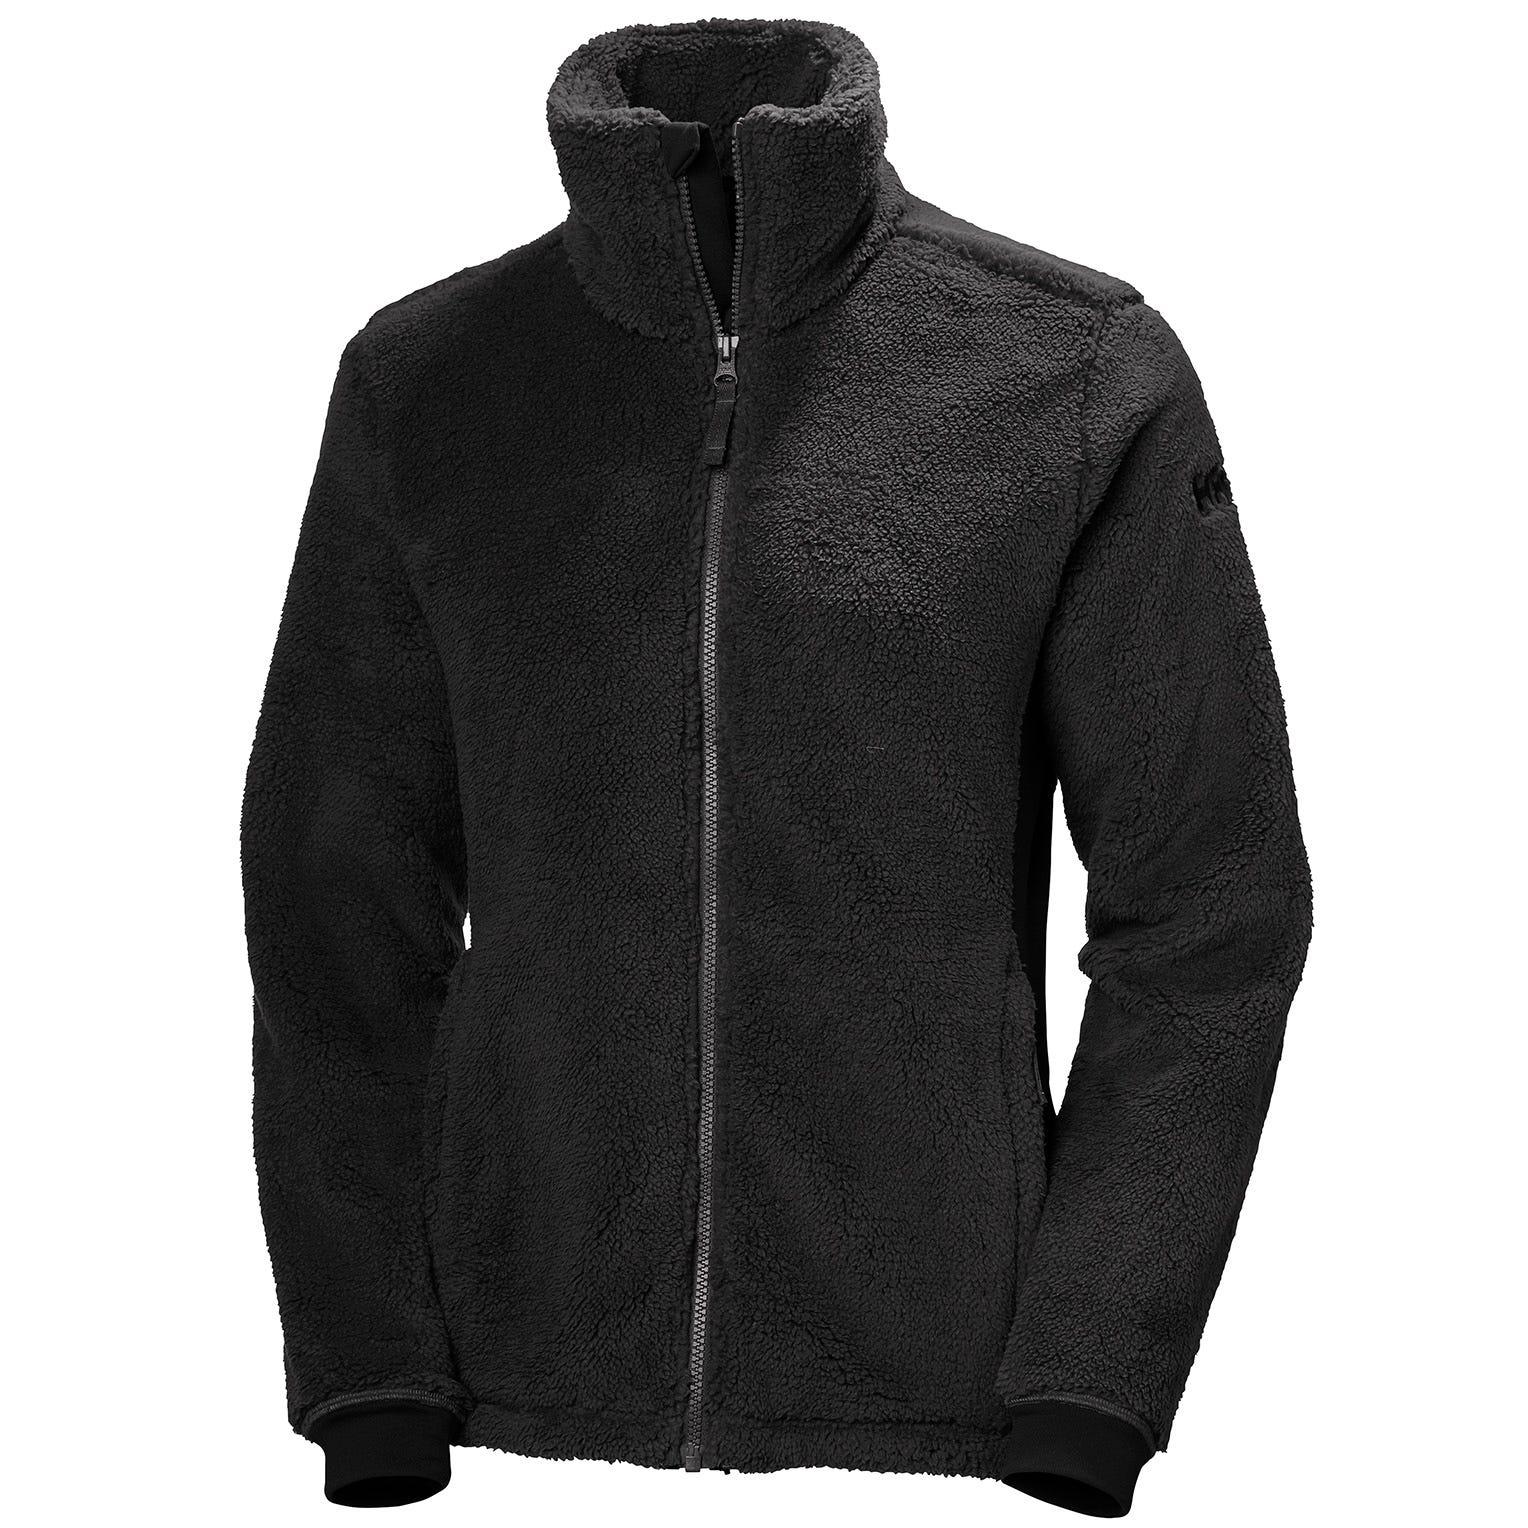 Helly Hansen Womens Precious Fleece Jacket Black XS